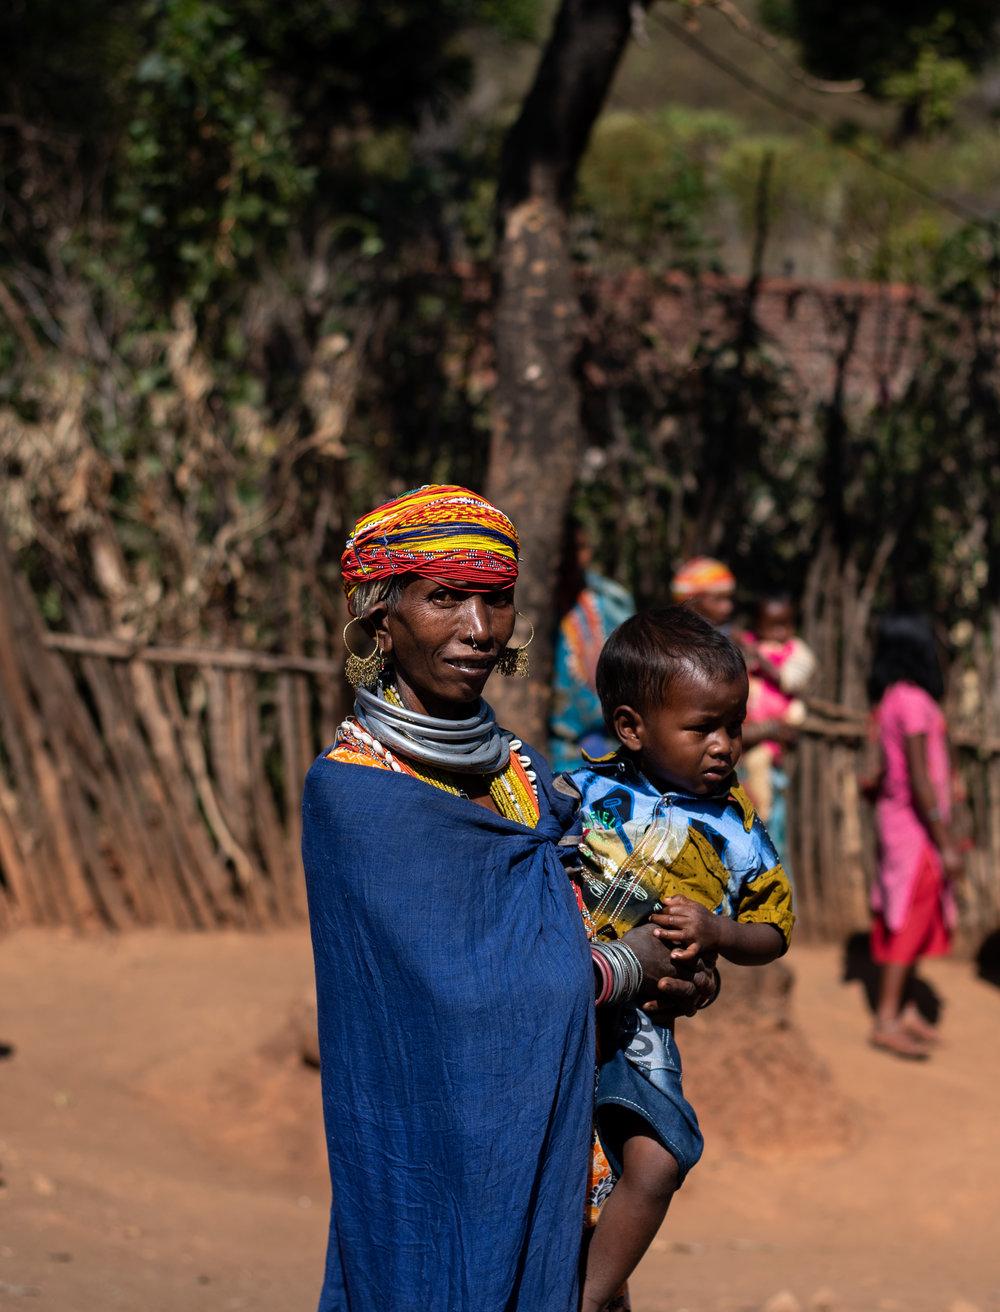 A Bonda woman with kid